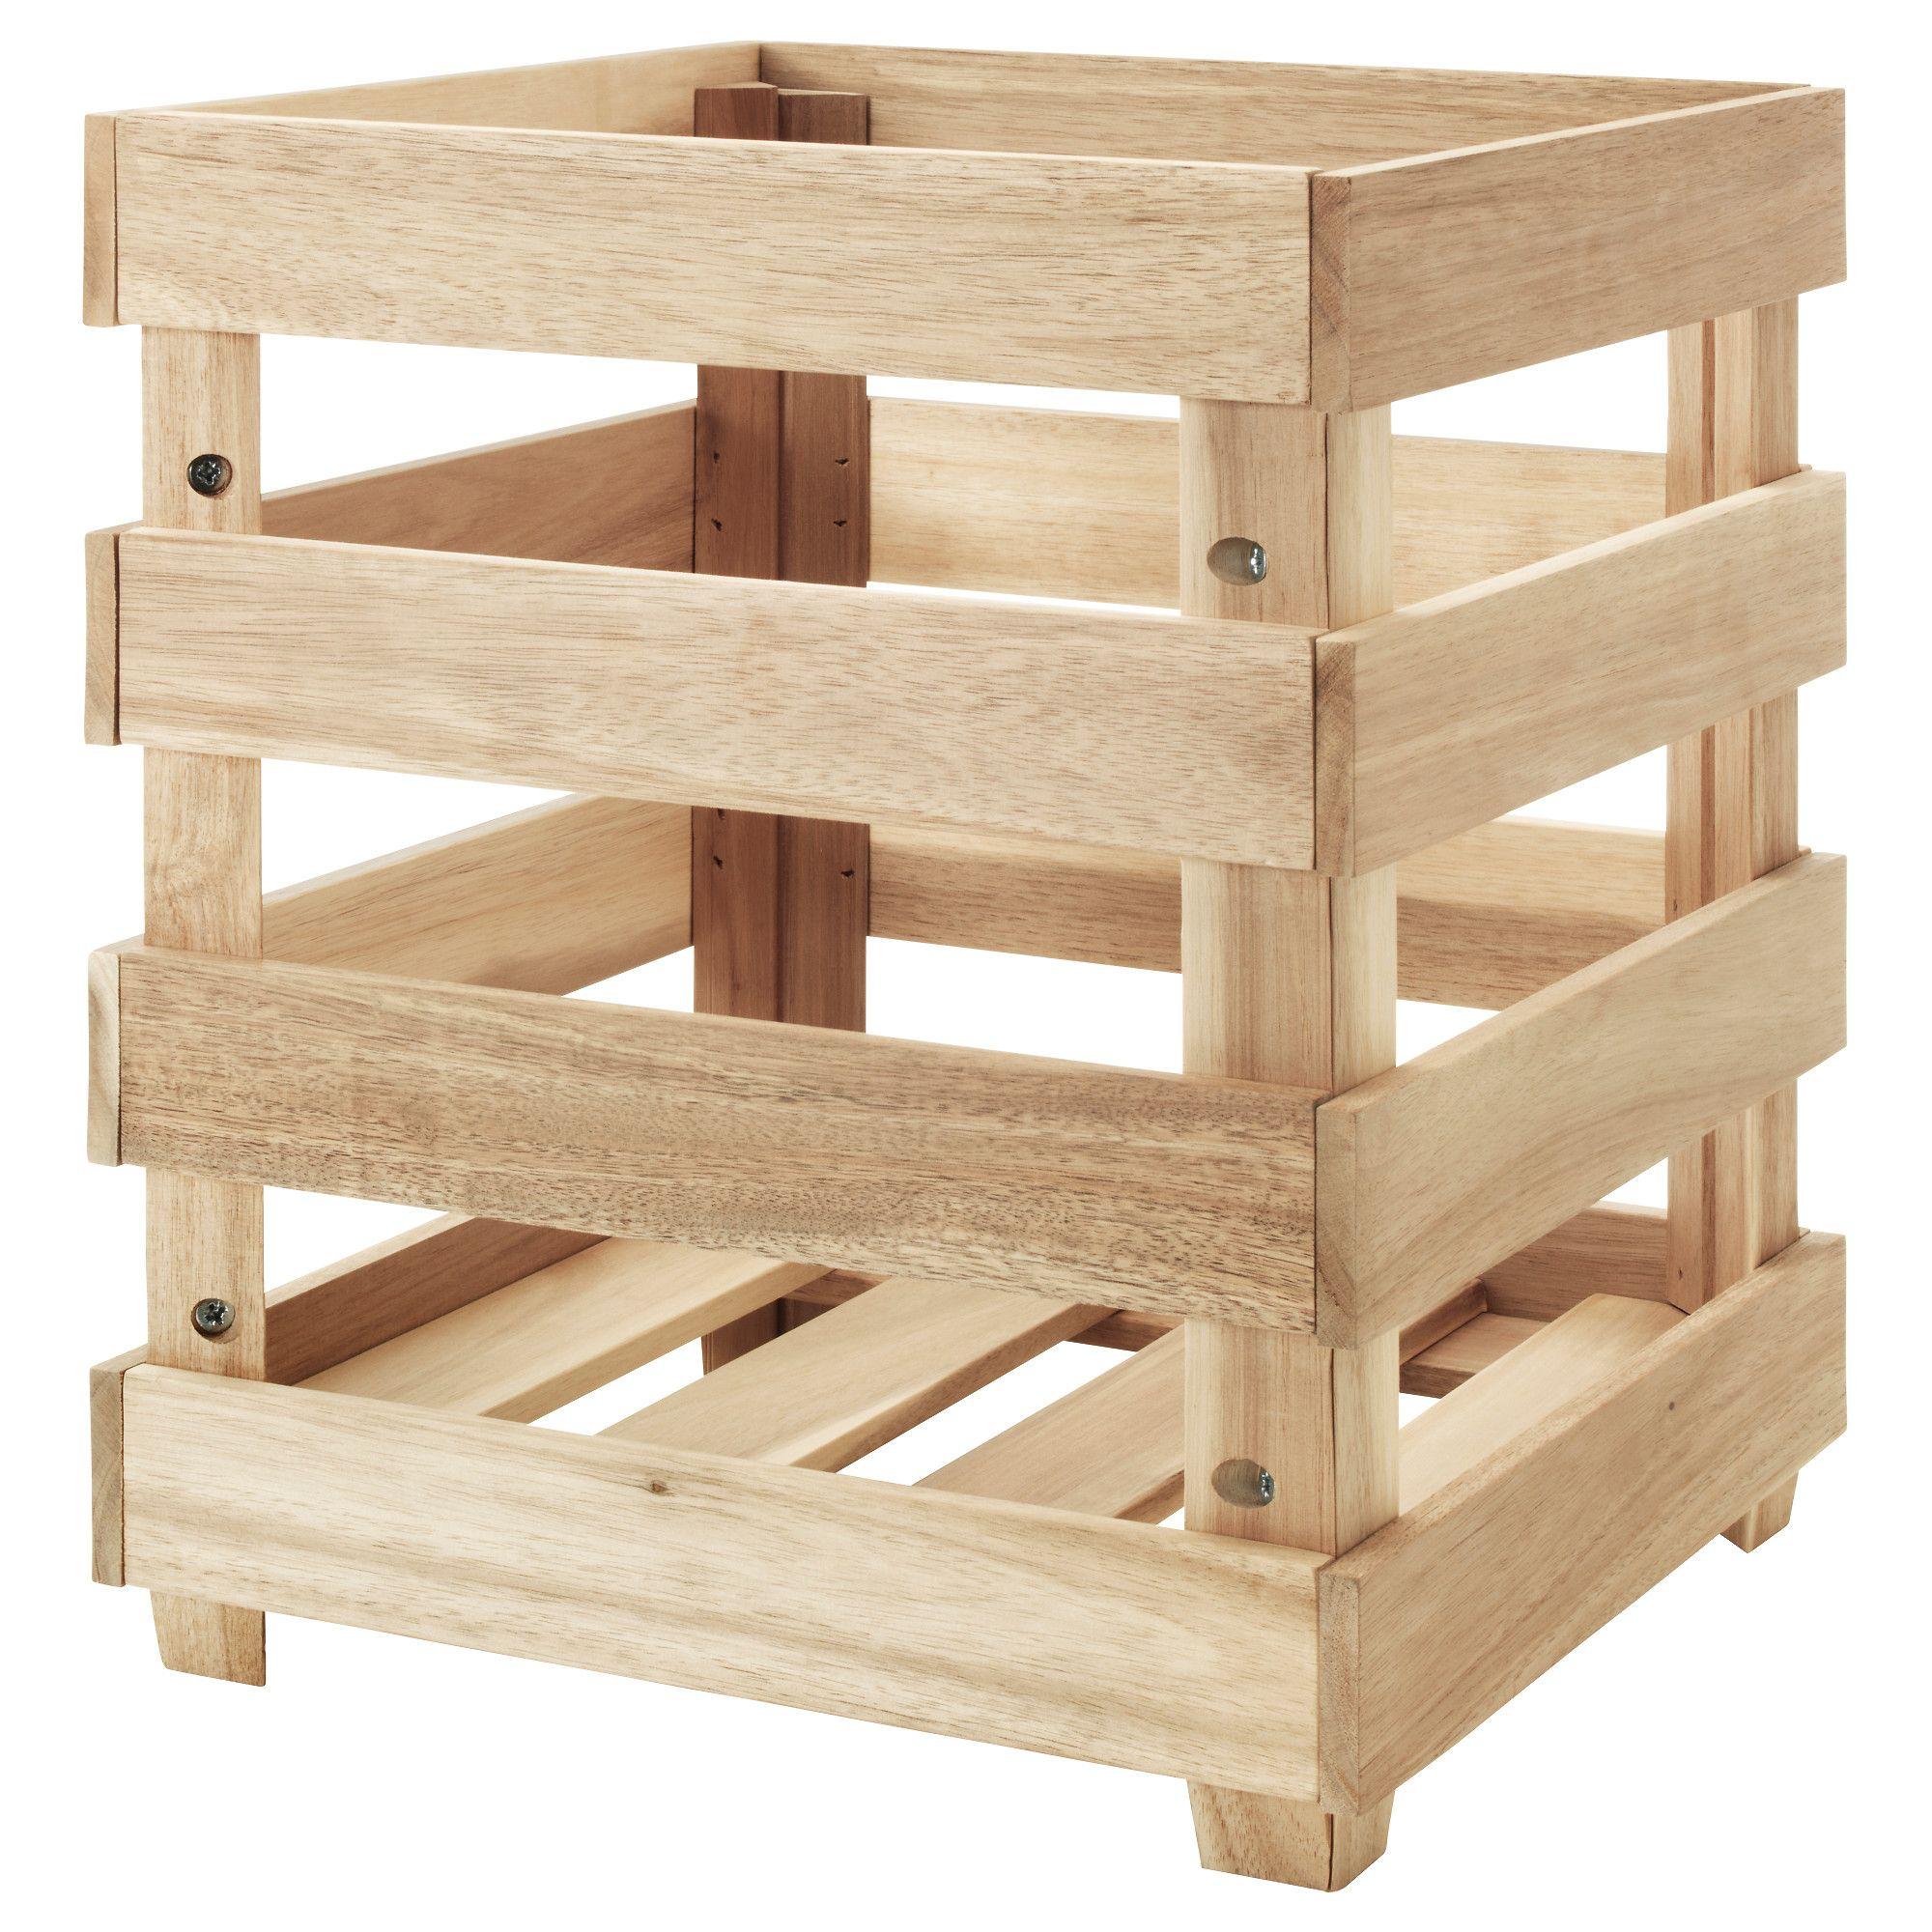 IKEA SKOGSTA Storage crate What could we put in here